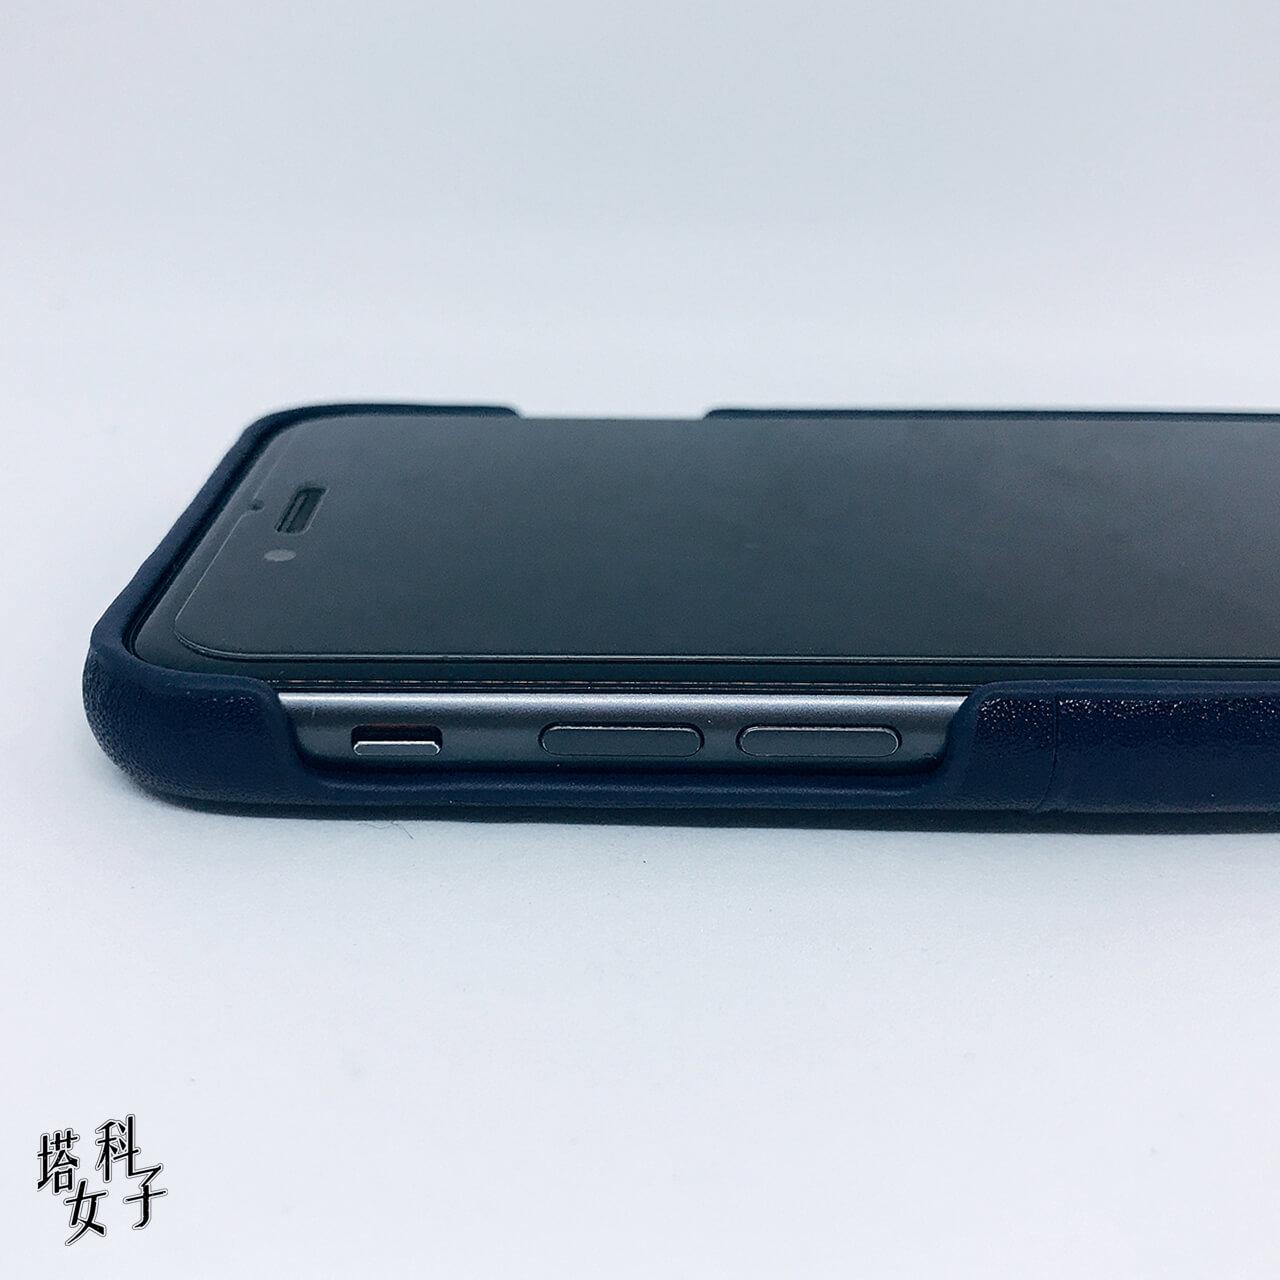 iPhone 手機殼開箱 - alto 側面